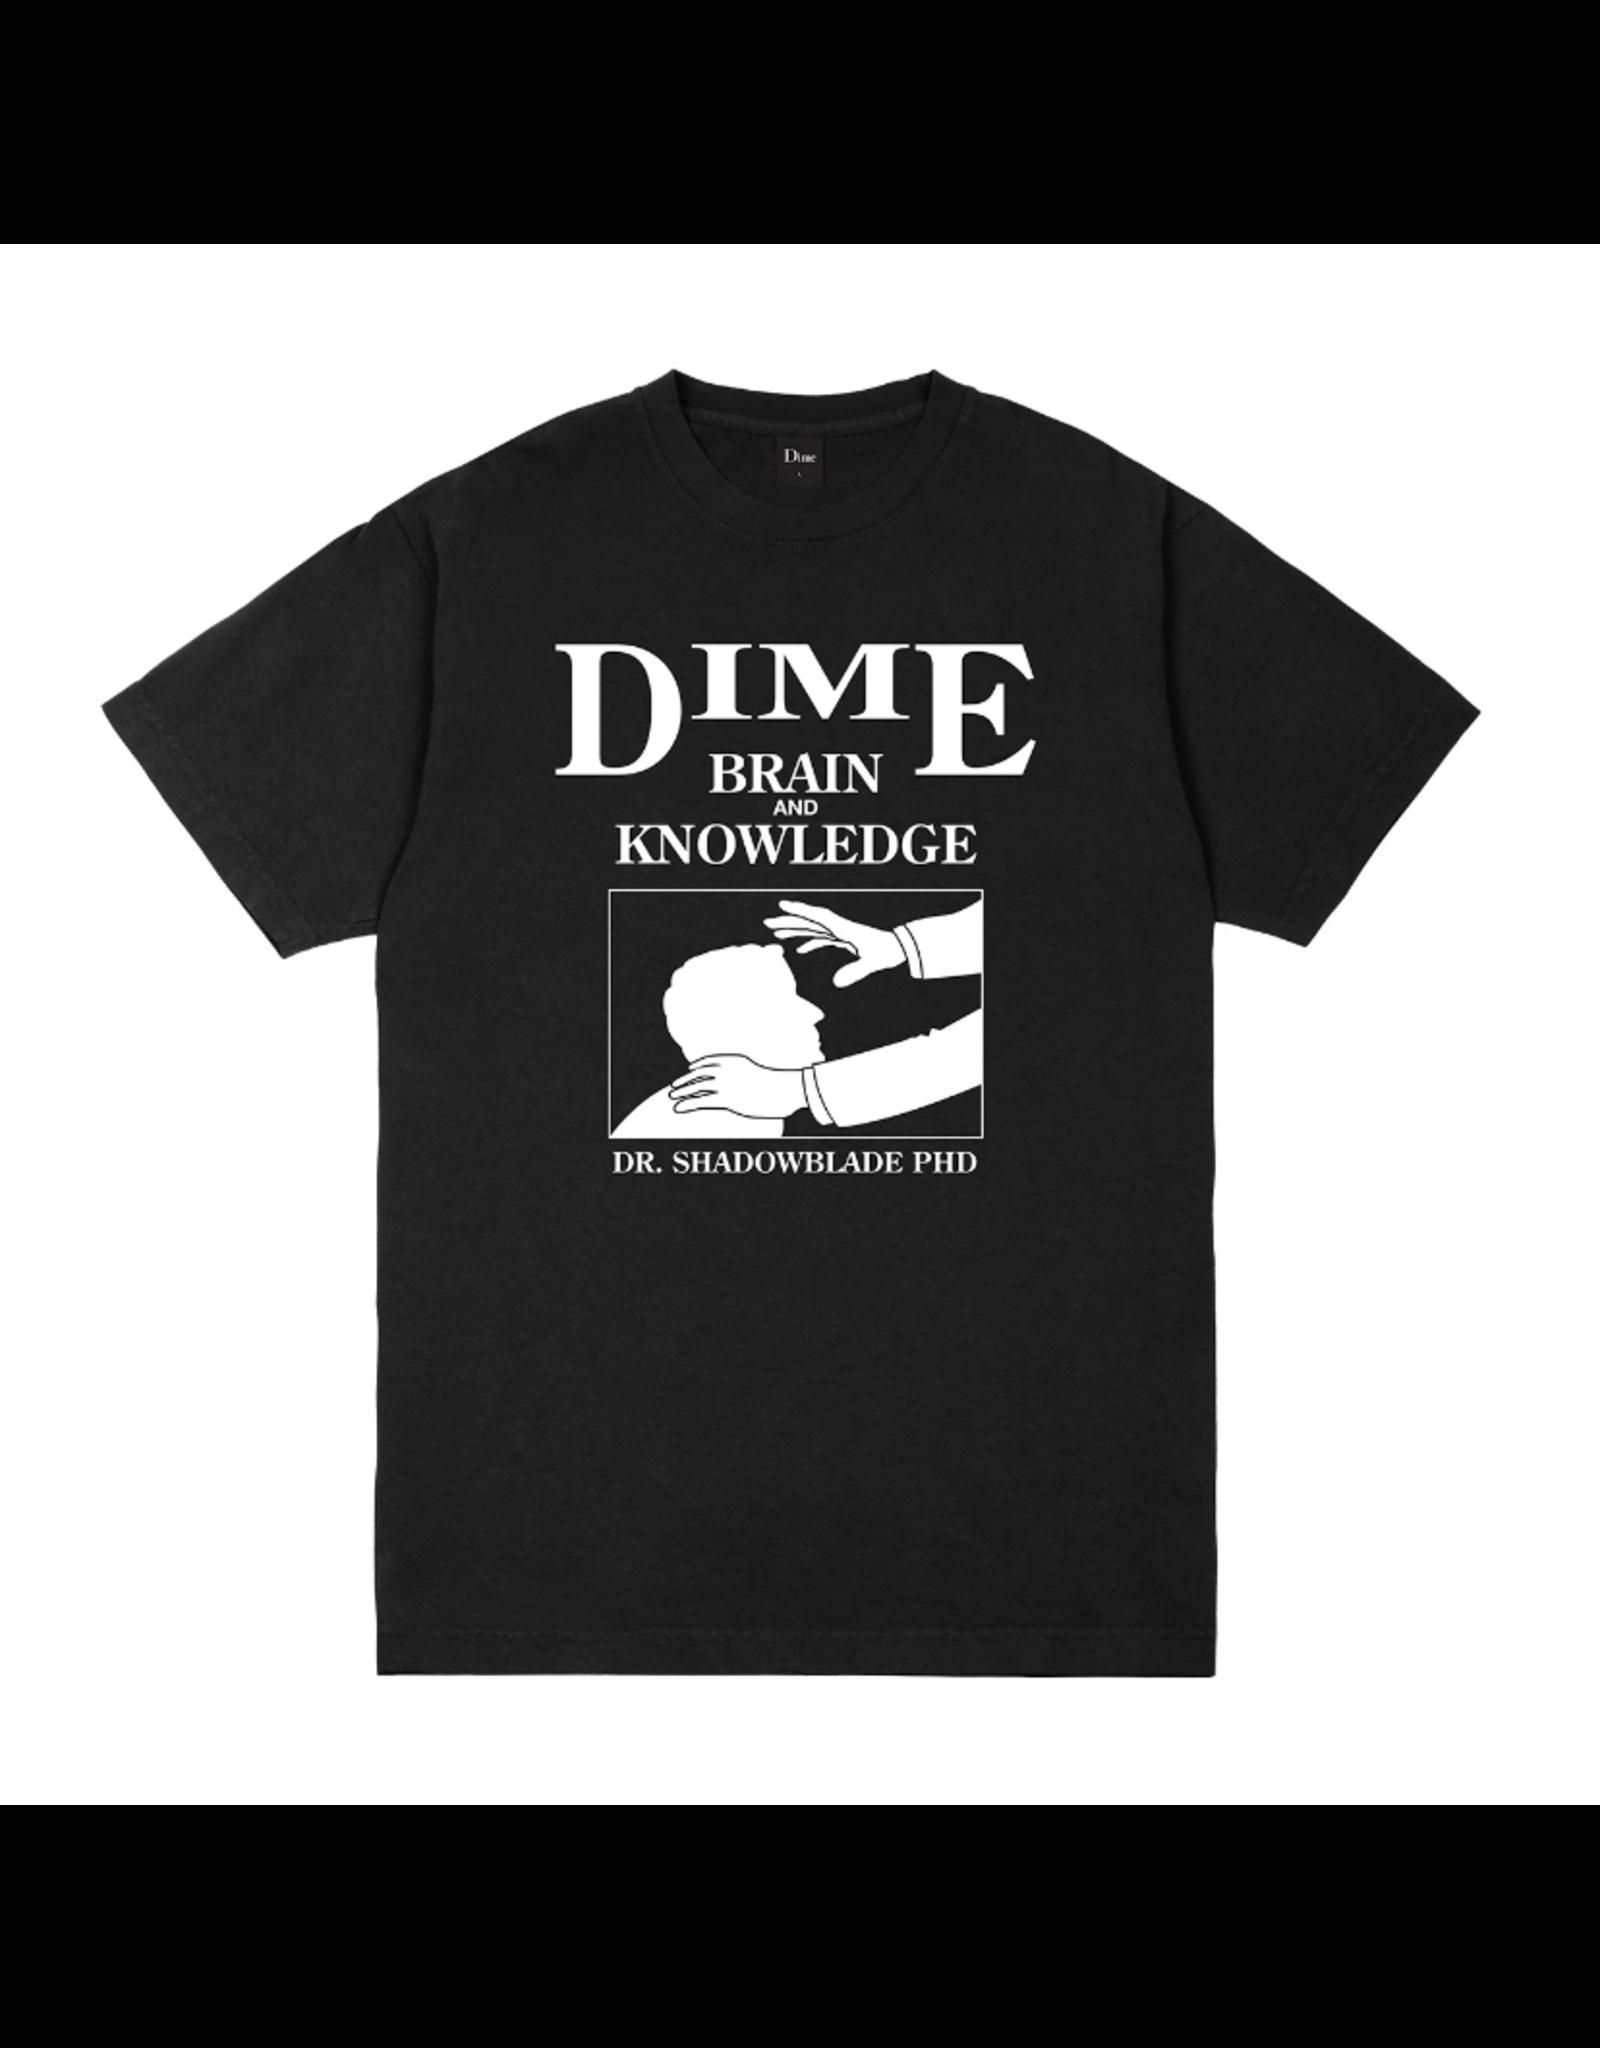 Dime Evan T-Shirt - Black